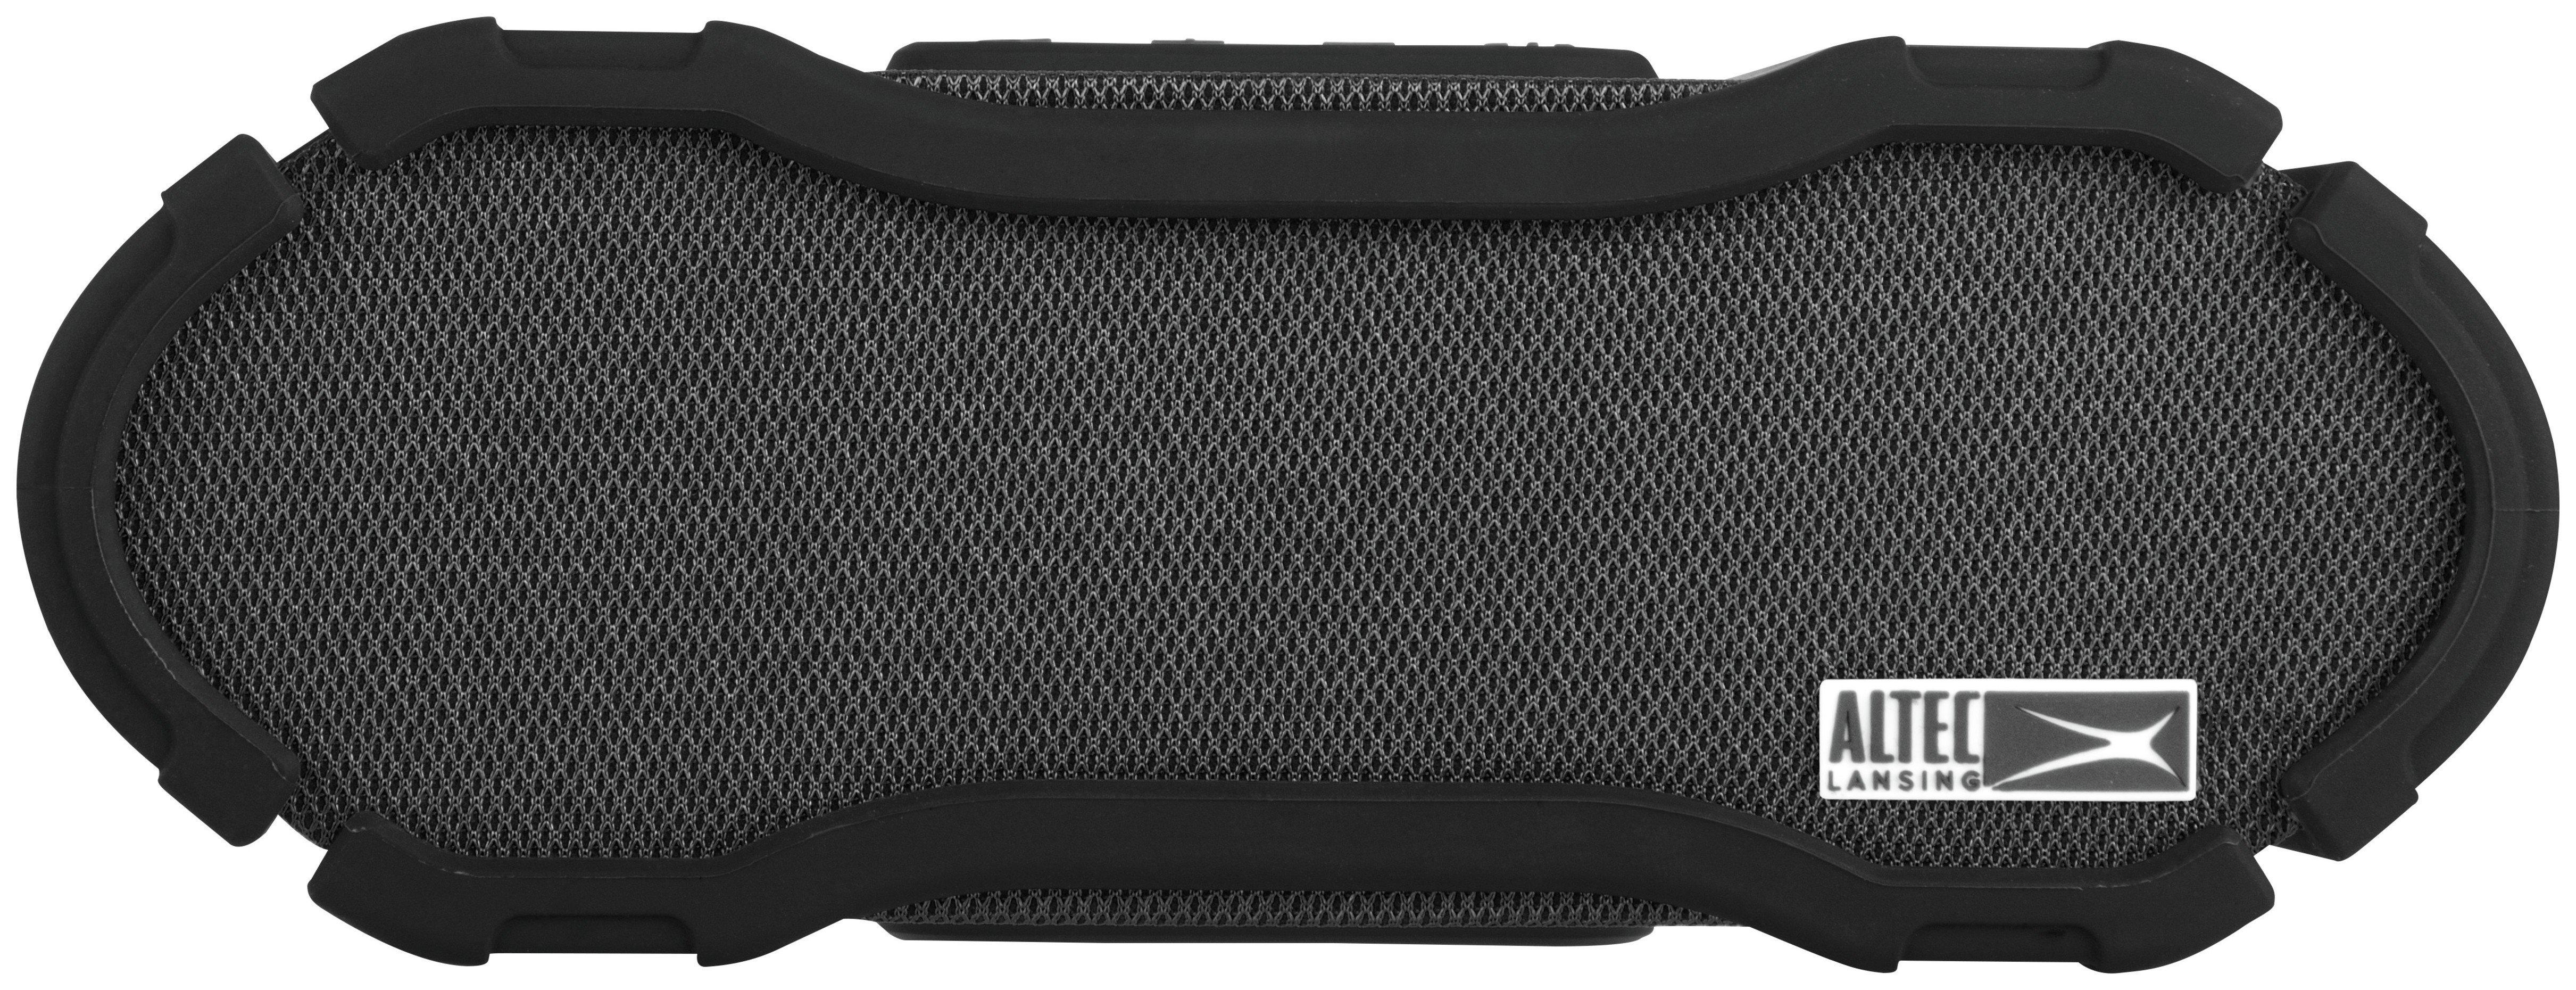 Image of Mini Boom Jacket Portable Wireless Speaker - Black.